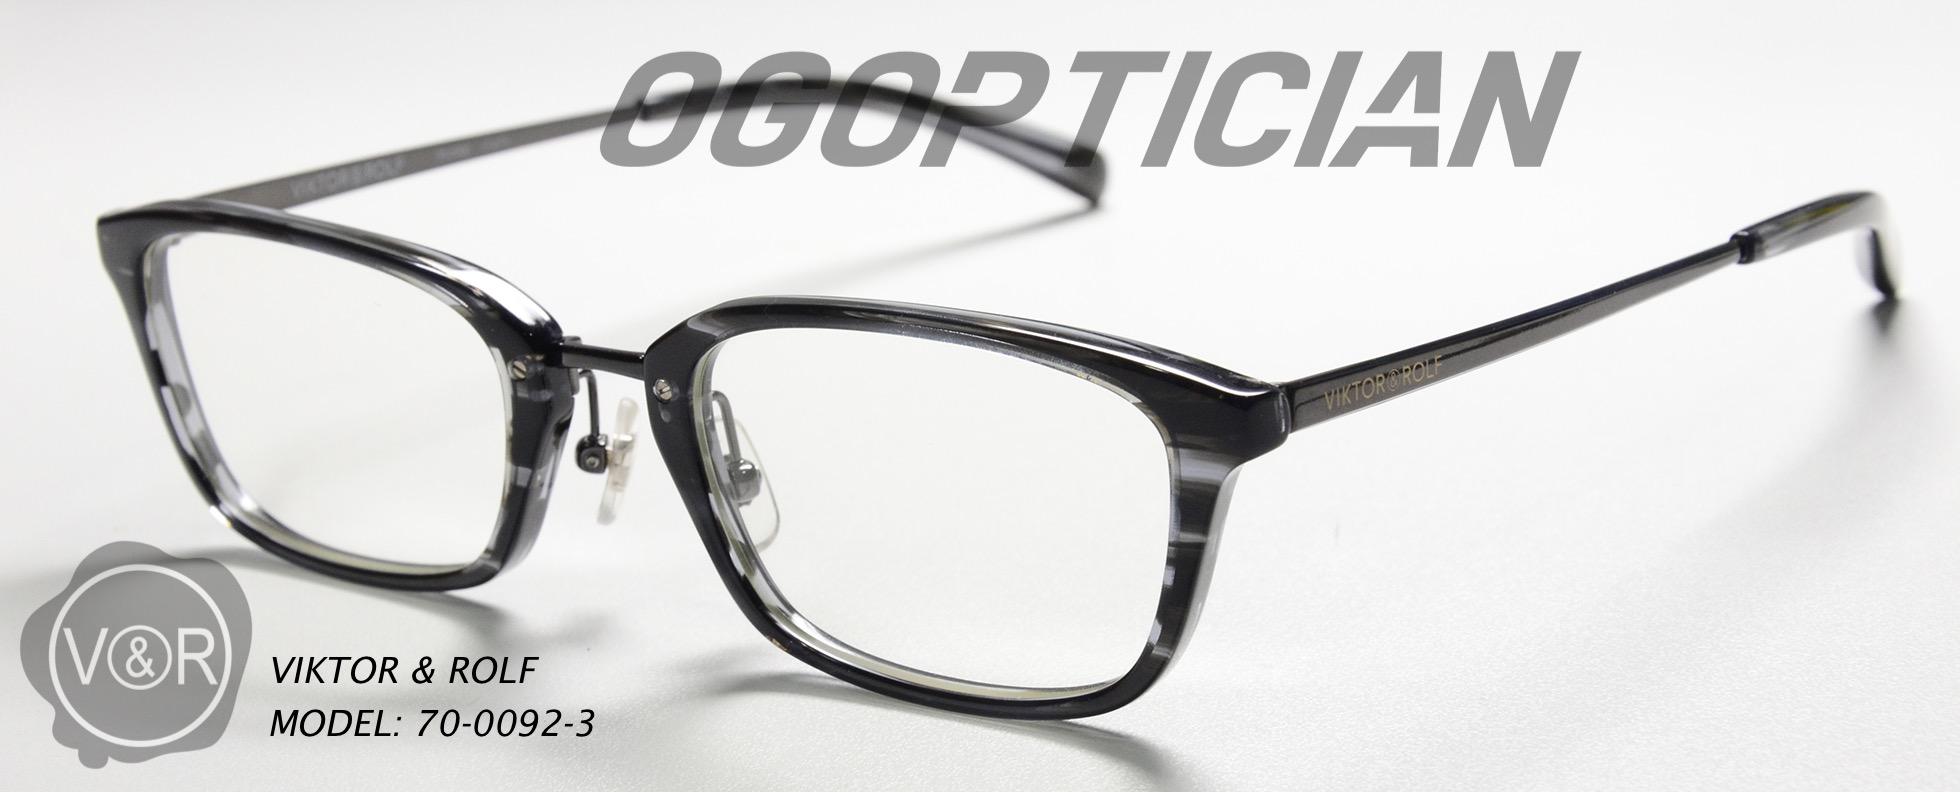 VIKTORANDROLF 70-0092-3